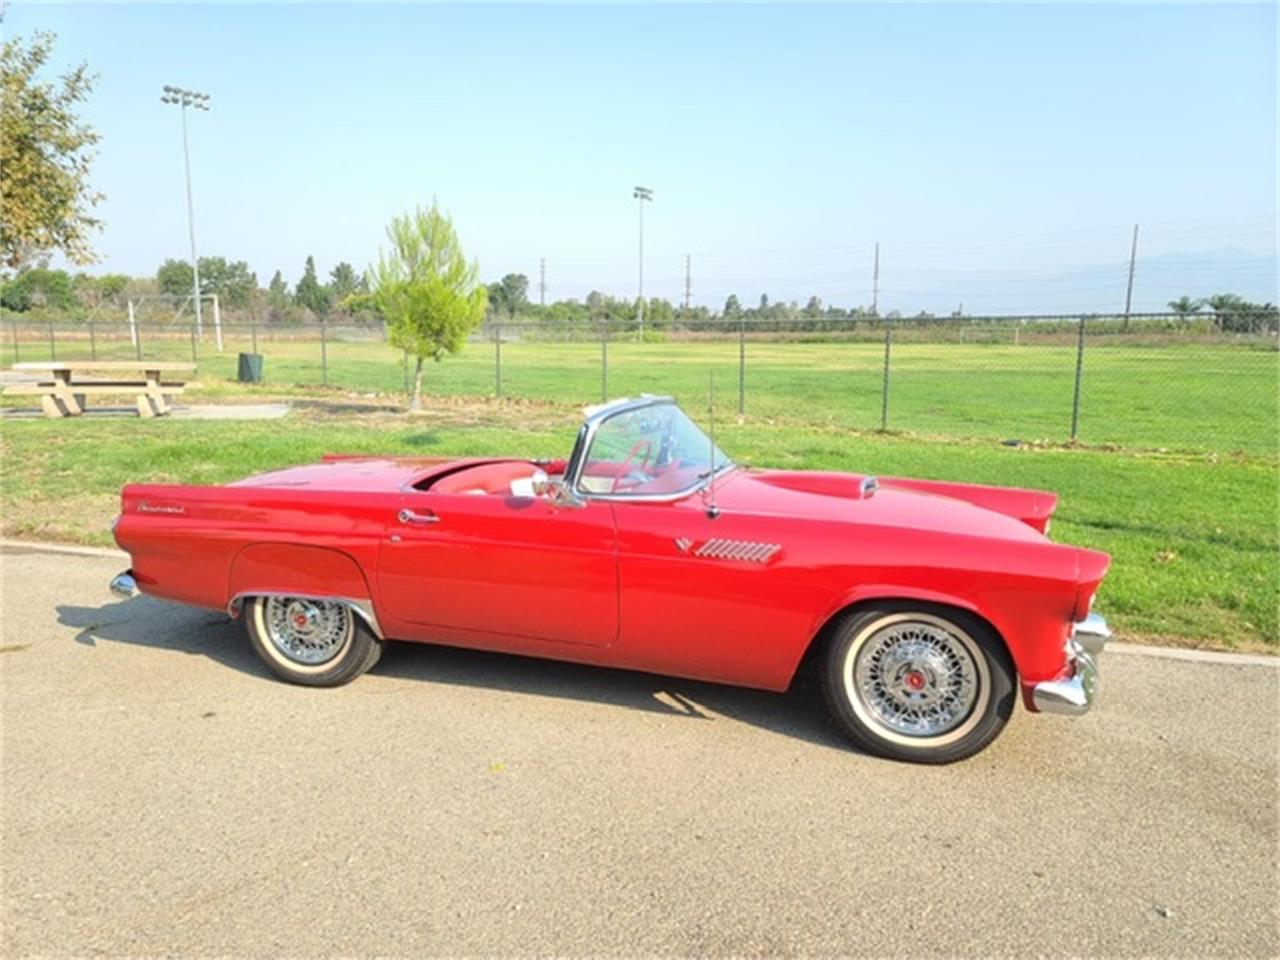 1955 Ford Thunderbird (CC-1411602) for sale in El monte, California